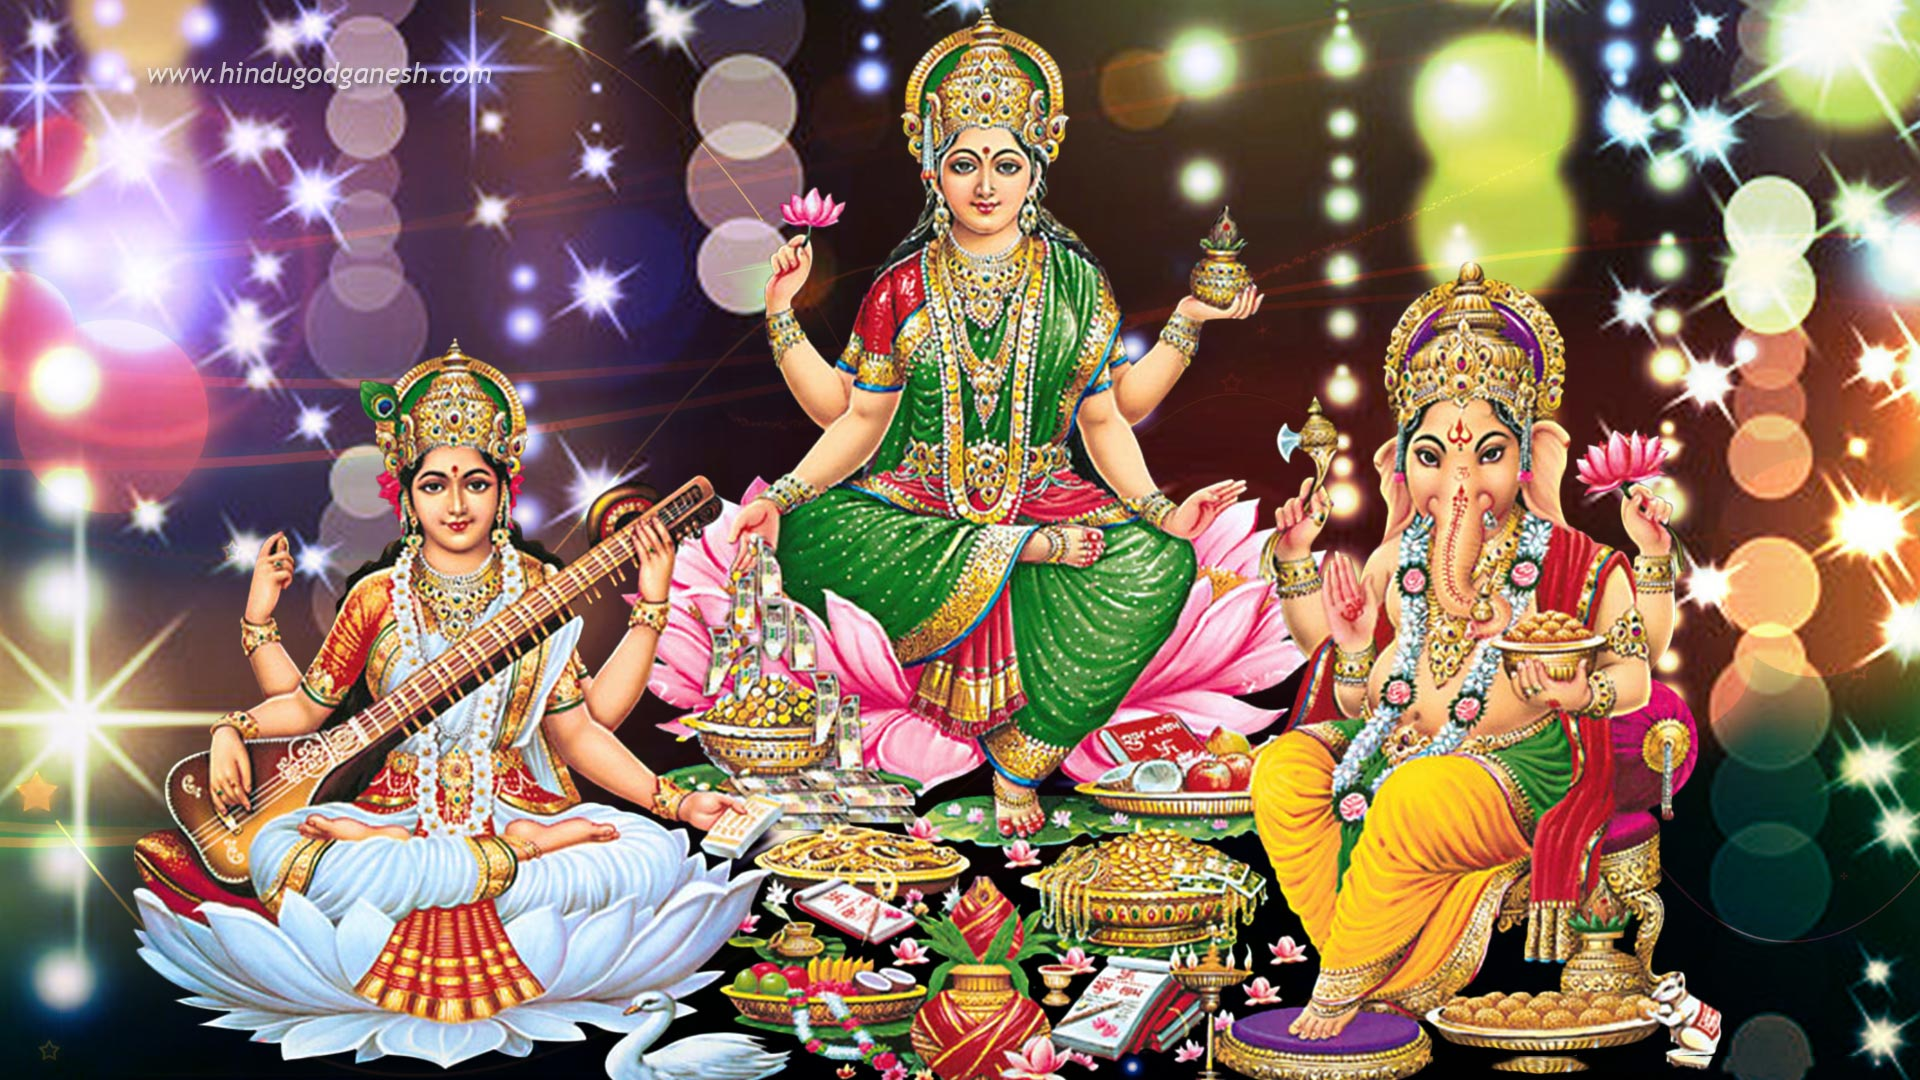 Happy Diwali Desktop Pc Laptop Hd Wallpapers Full Screen: Maa Laxmi Wallpaper Full Size Download For Desktop